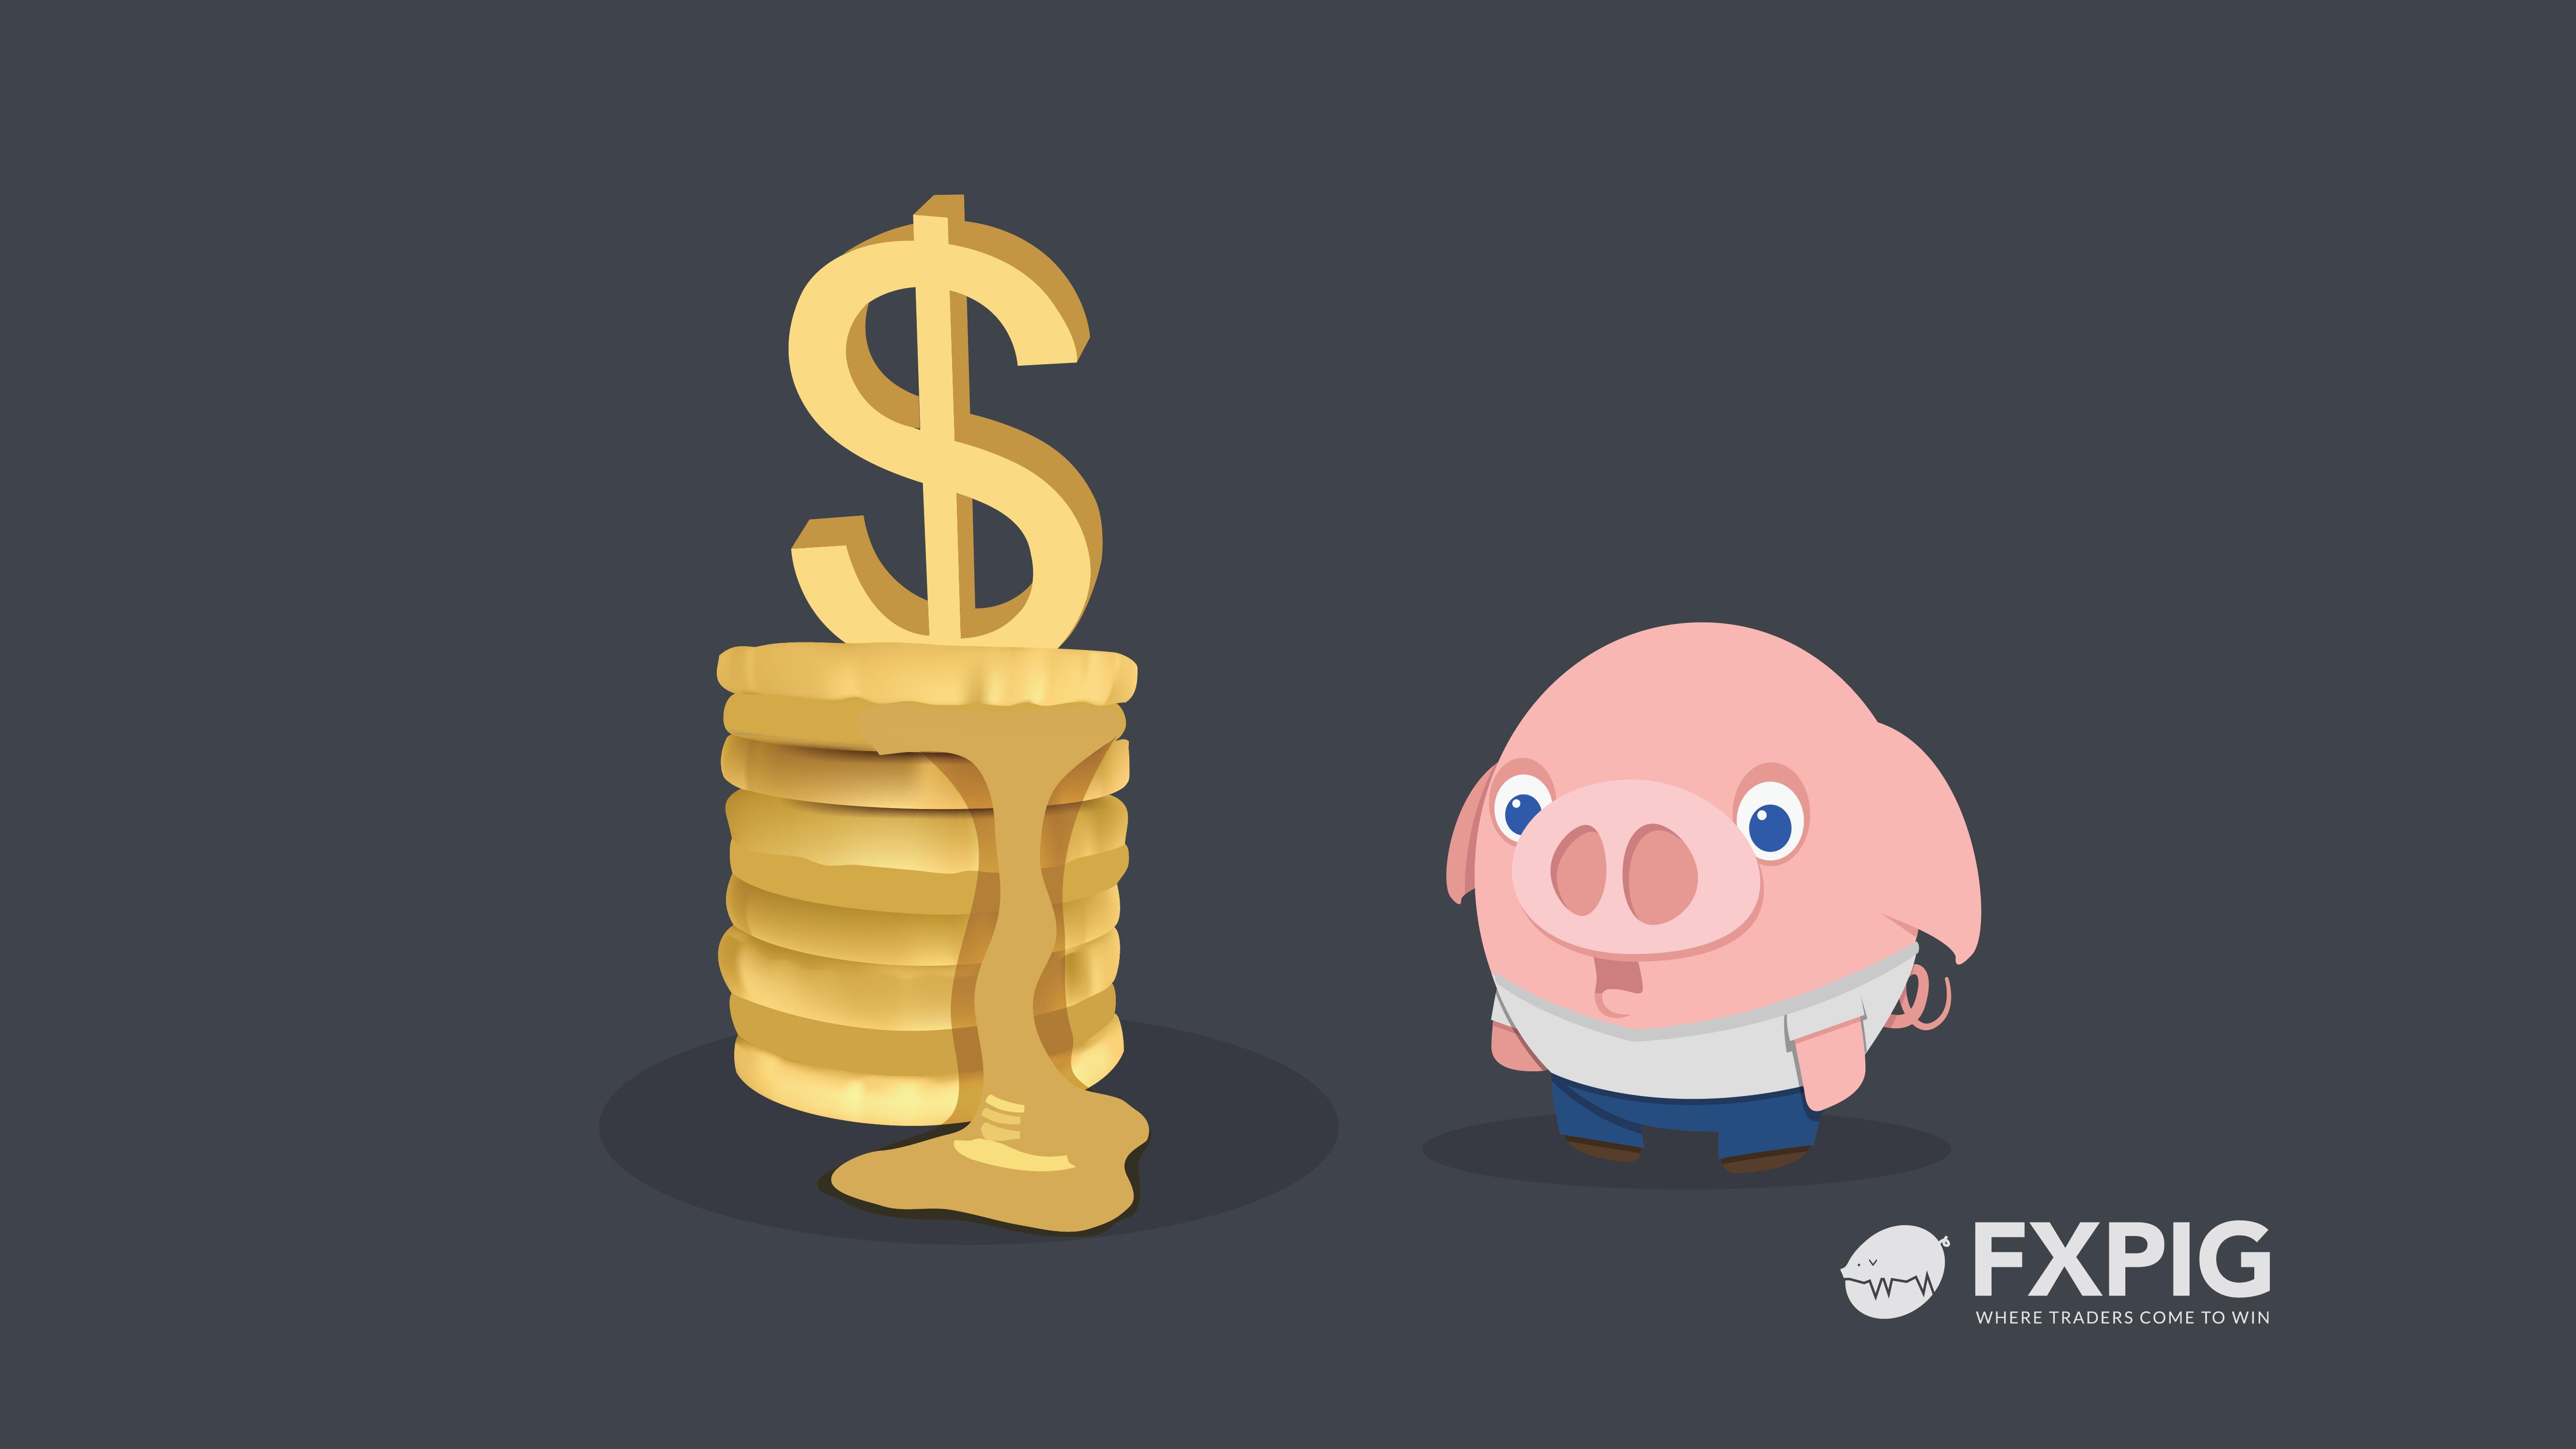 Melting_dollar_FXPIG